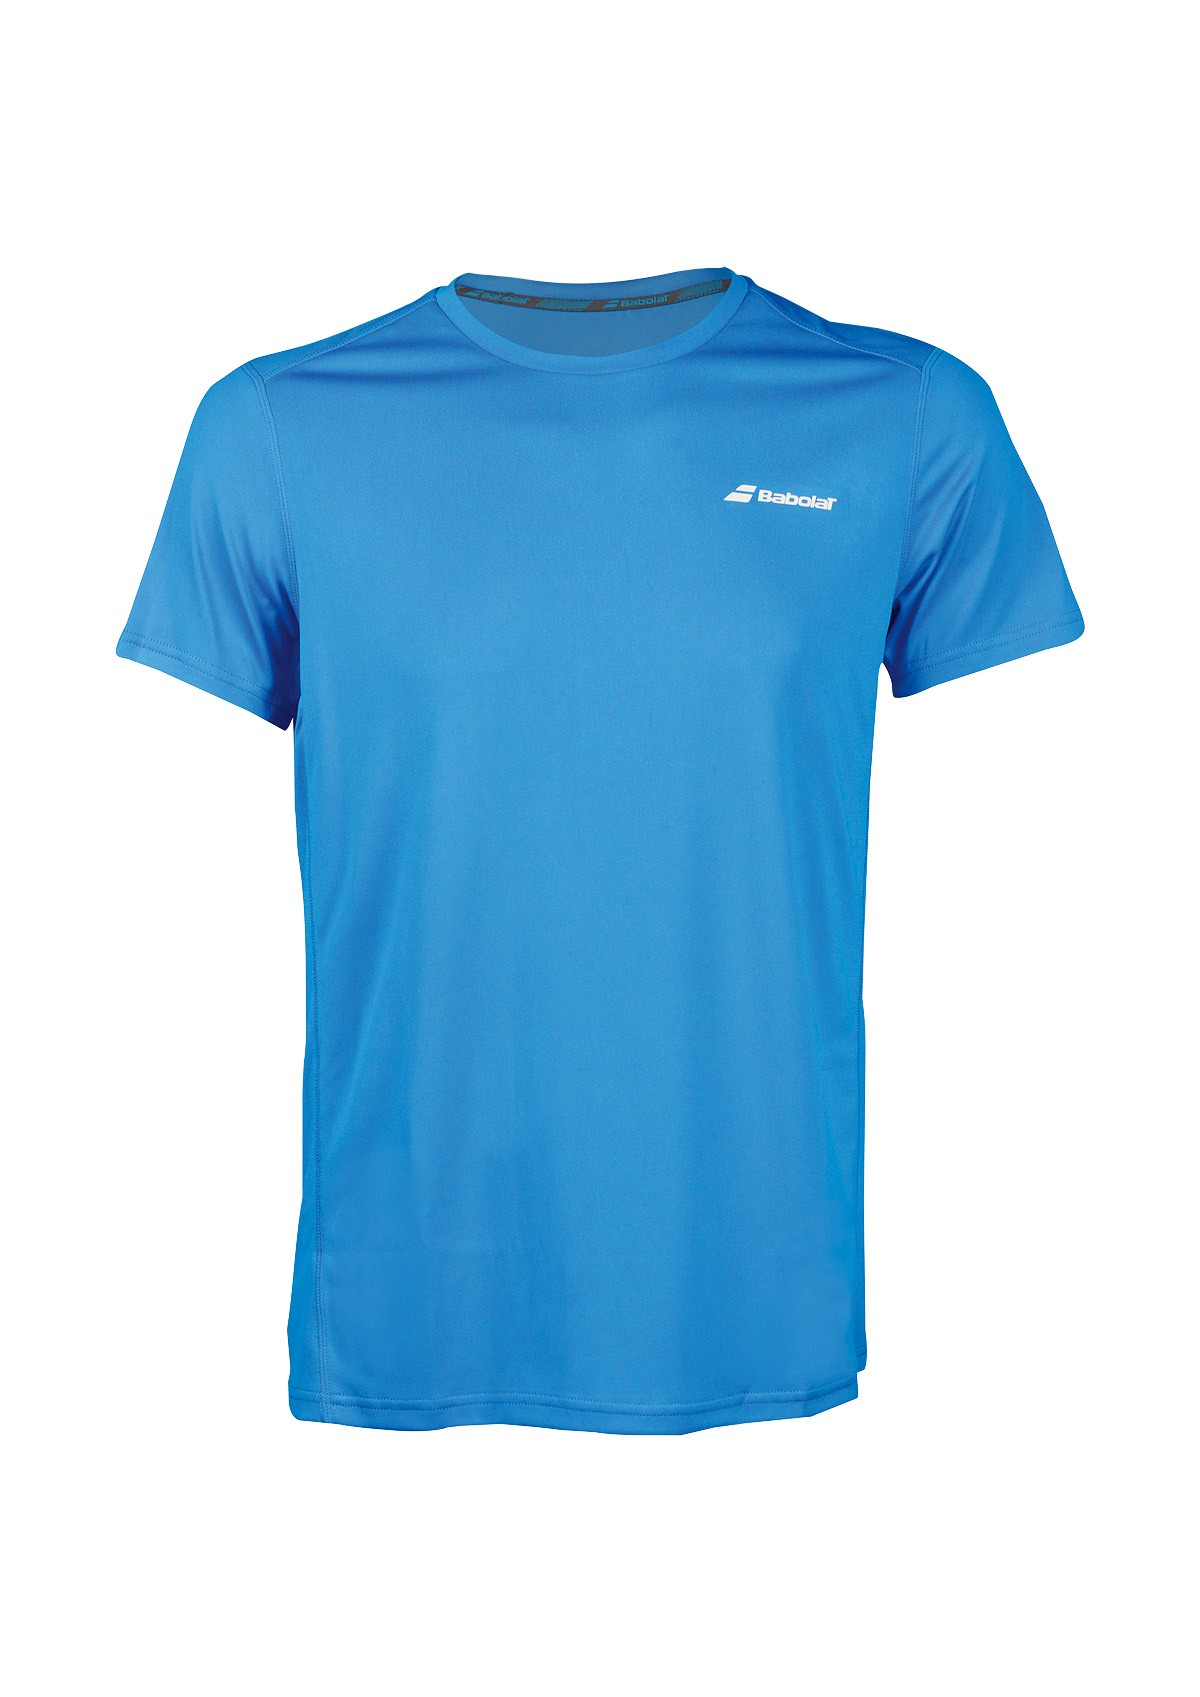 Koszulka tenisowa chłopięca Babolat CORE T-shirt Blue